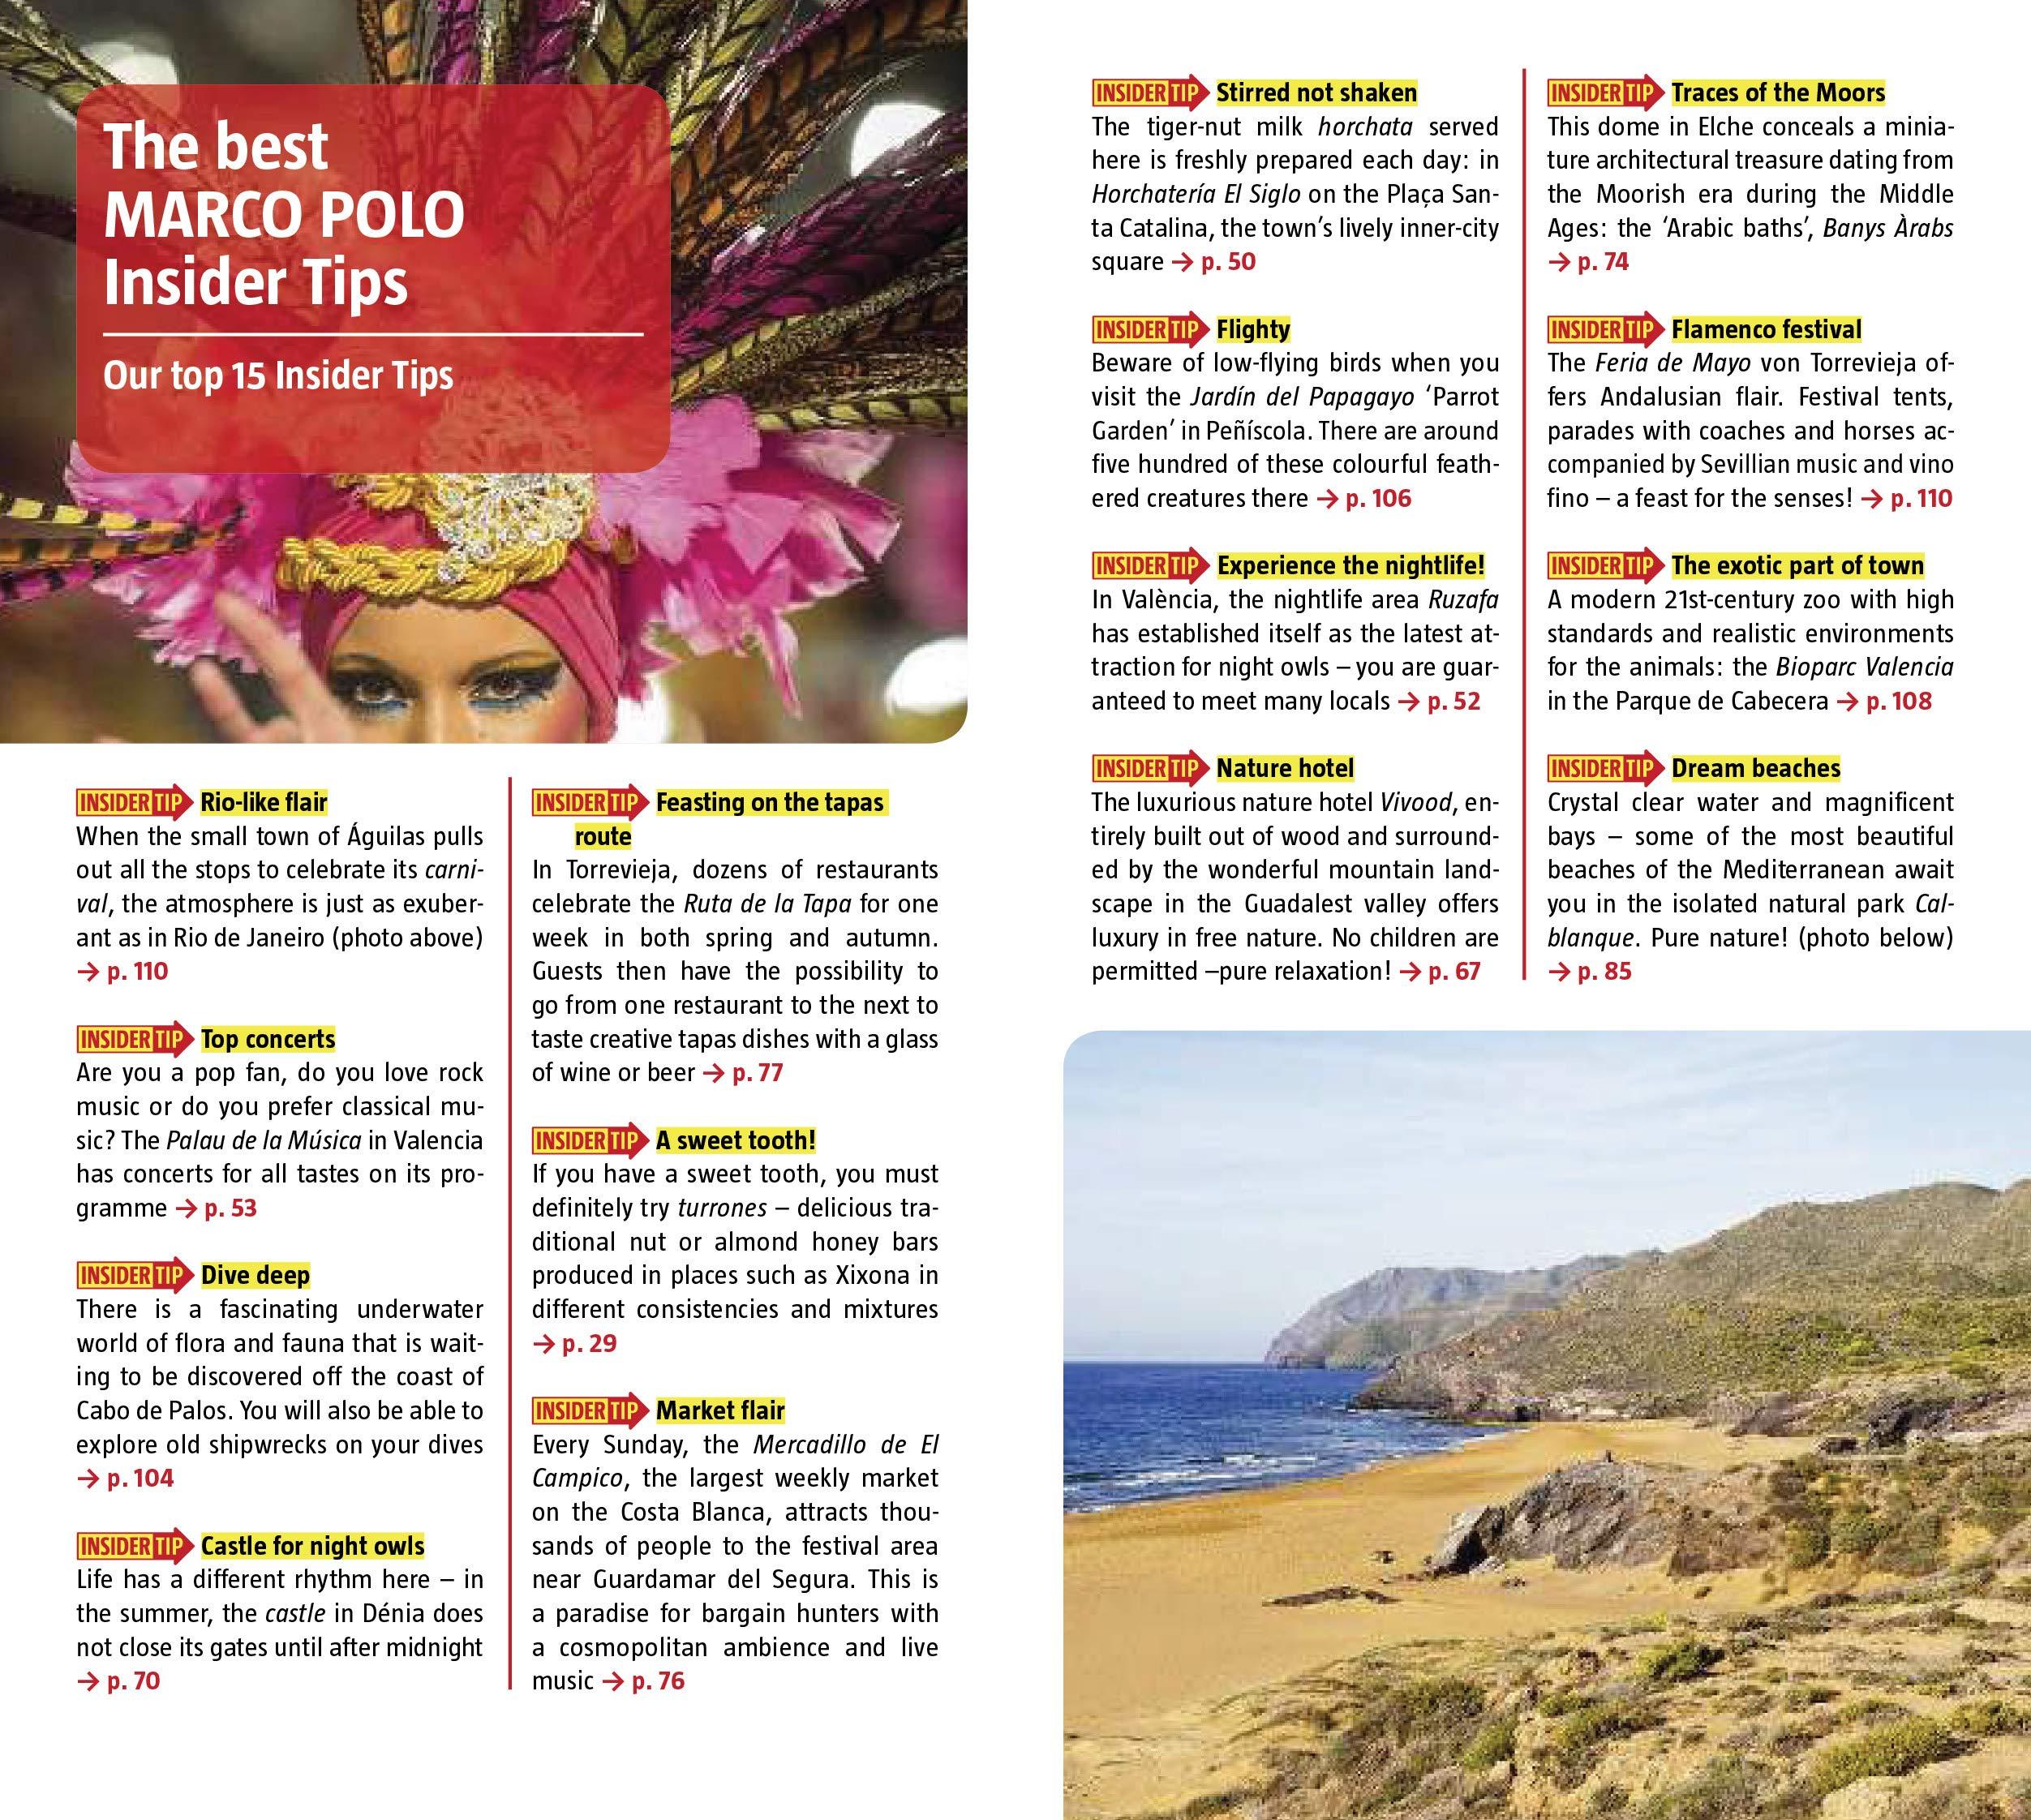 Costa Blanca Marco Polo Pocket Travel Guide - with pull out map (Marco Polo Pocket Guides): Marco Polo Travel Publishing: 9783829757553: Amazon.com: Books